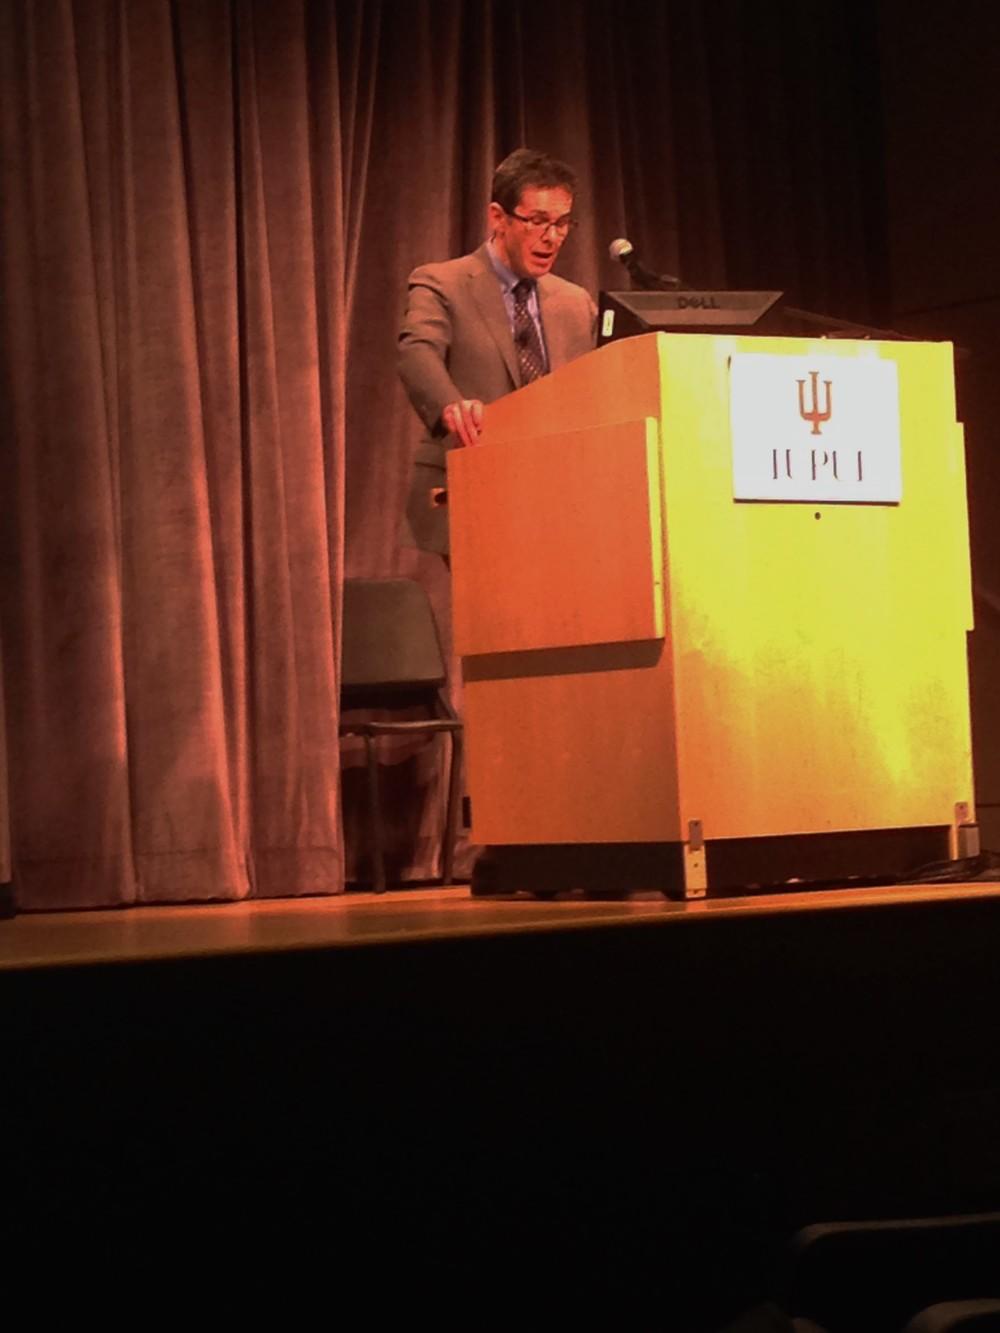 Dr. John Roseman addresses the crowd.